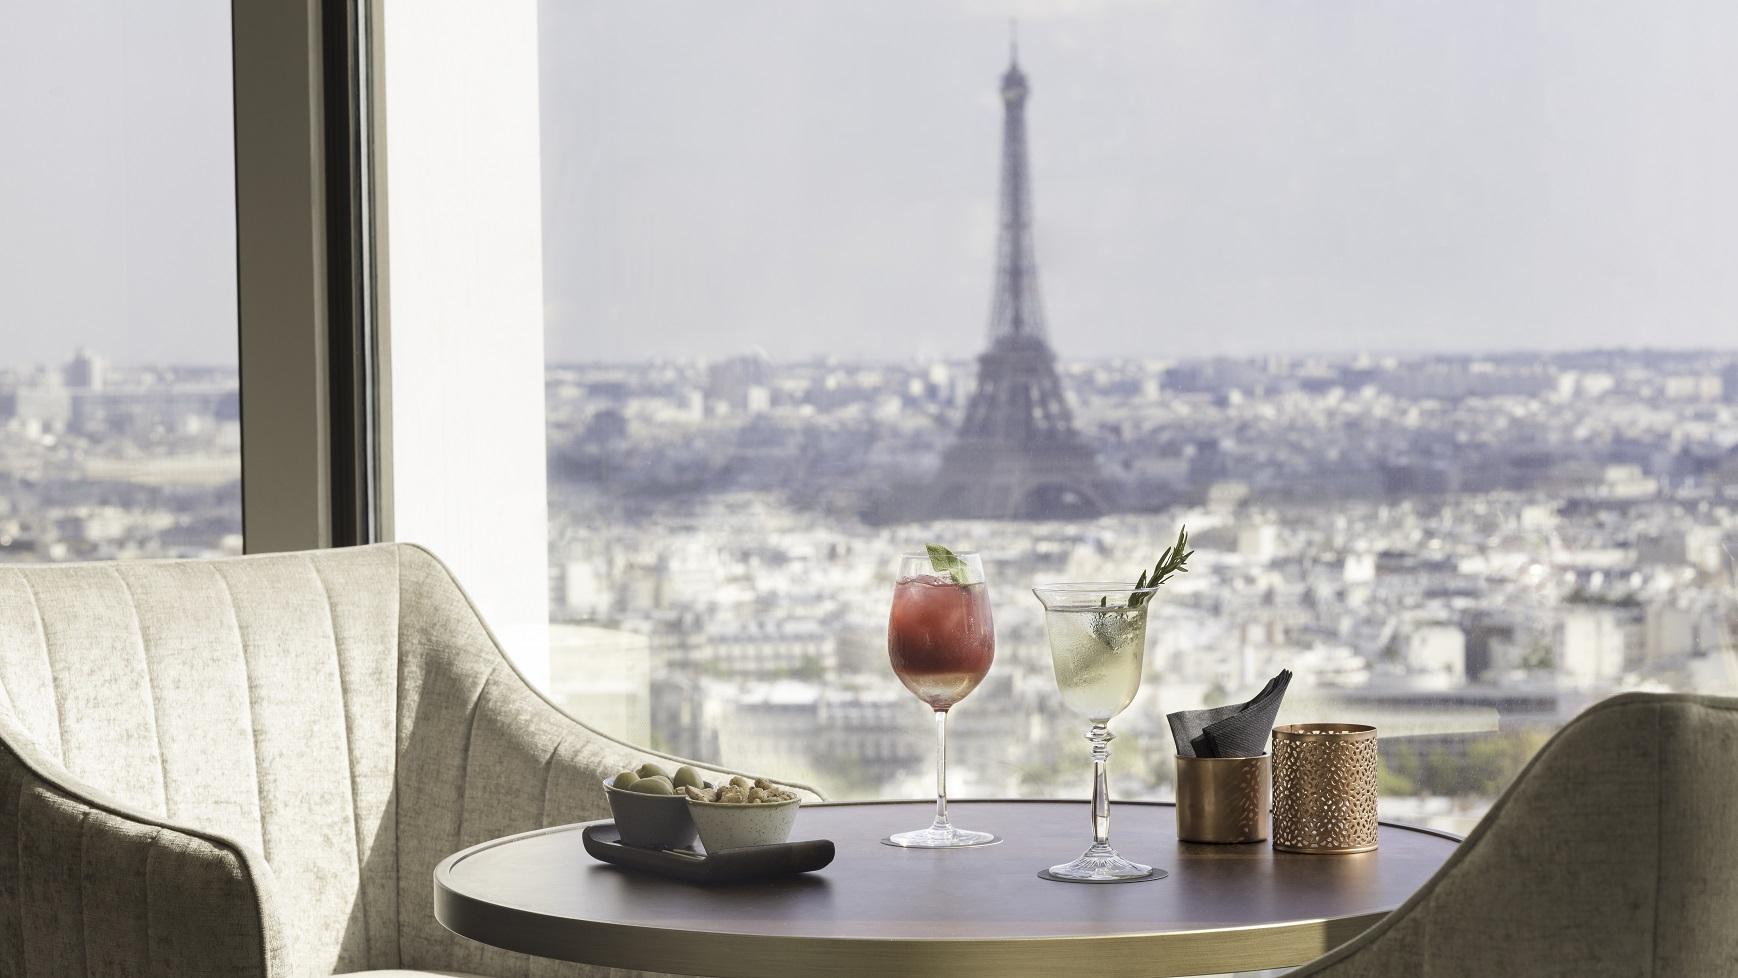 Hyatt-Regency-Paris-Etoile-Windo-View.jpg